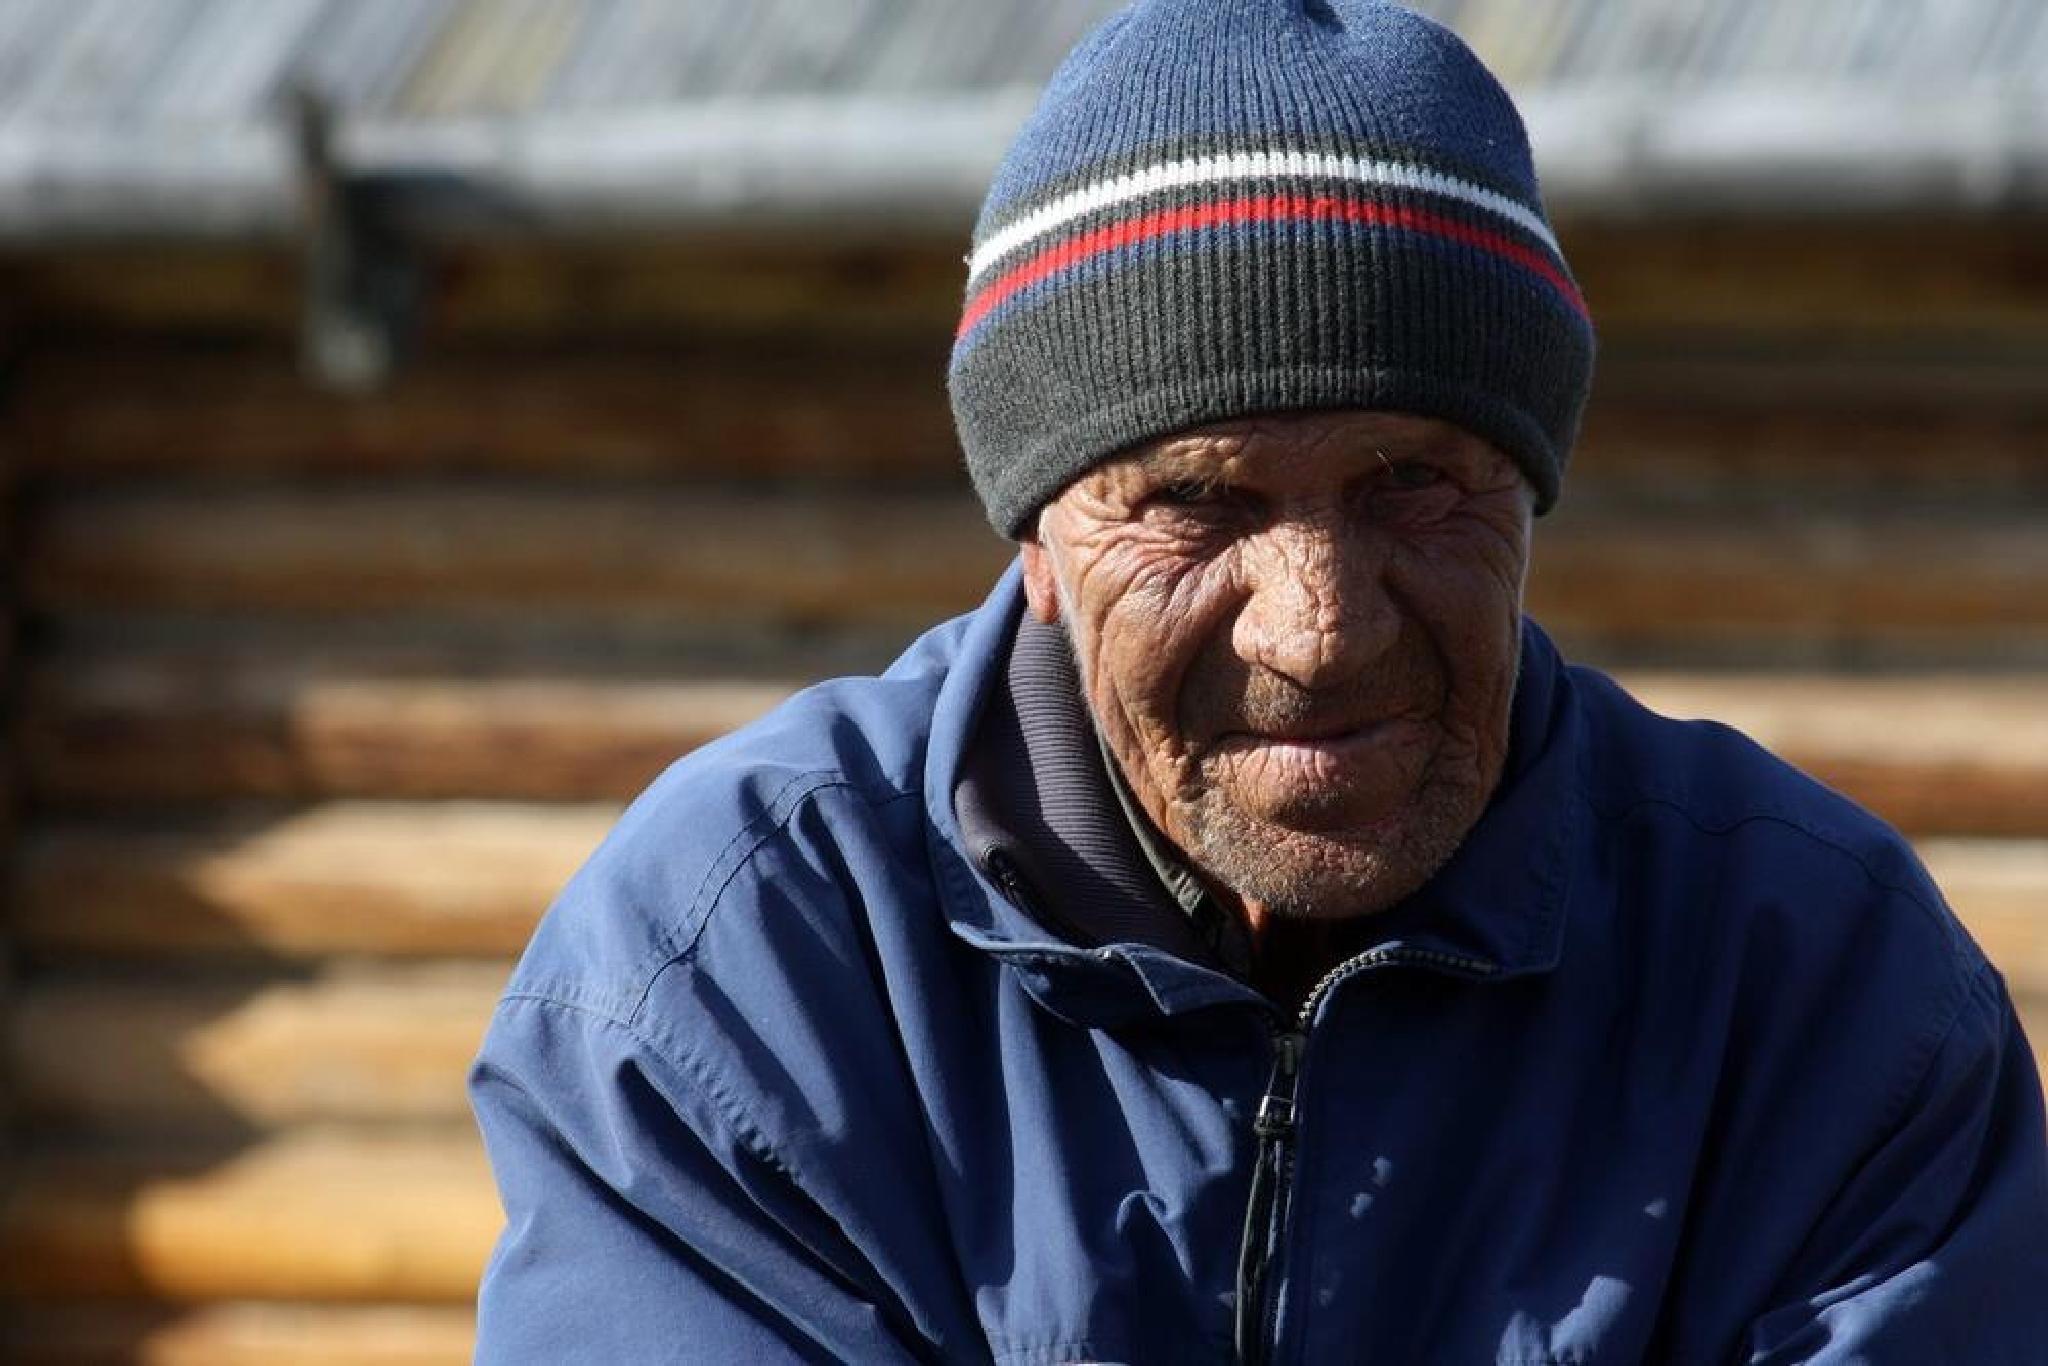 Old Man by monanorrman